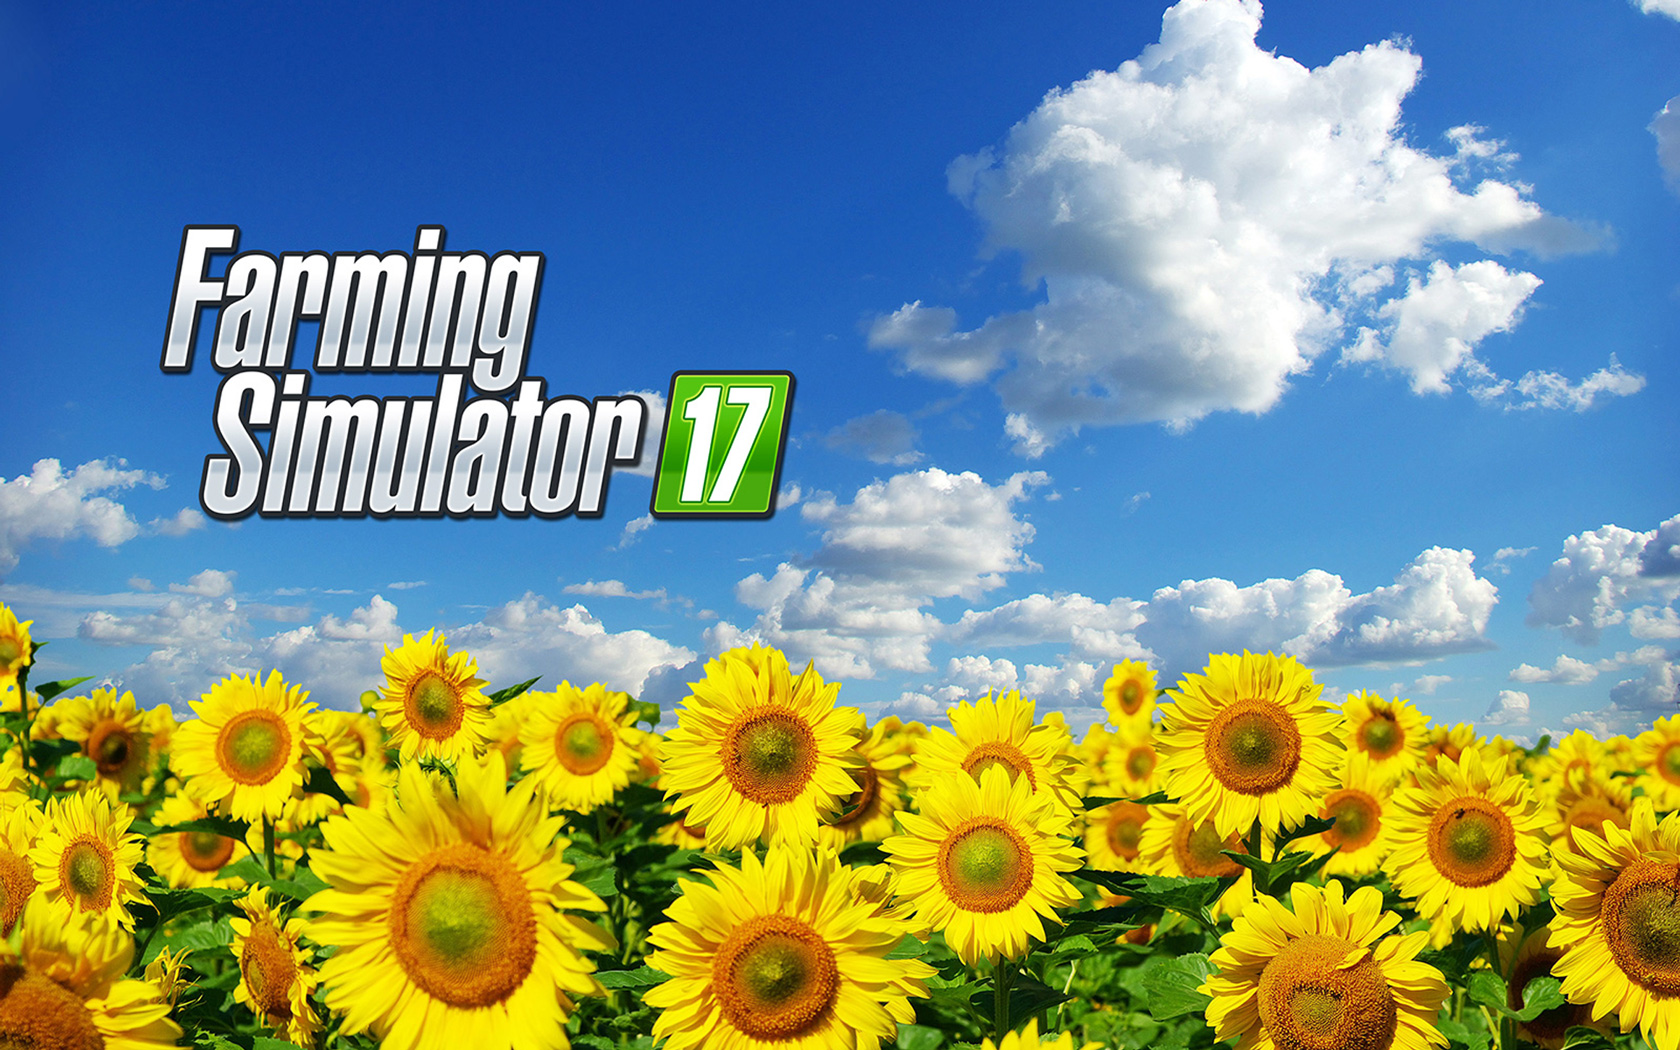 Free Farming Simulator 17 Wallpaper in 1680x1050